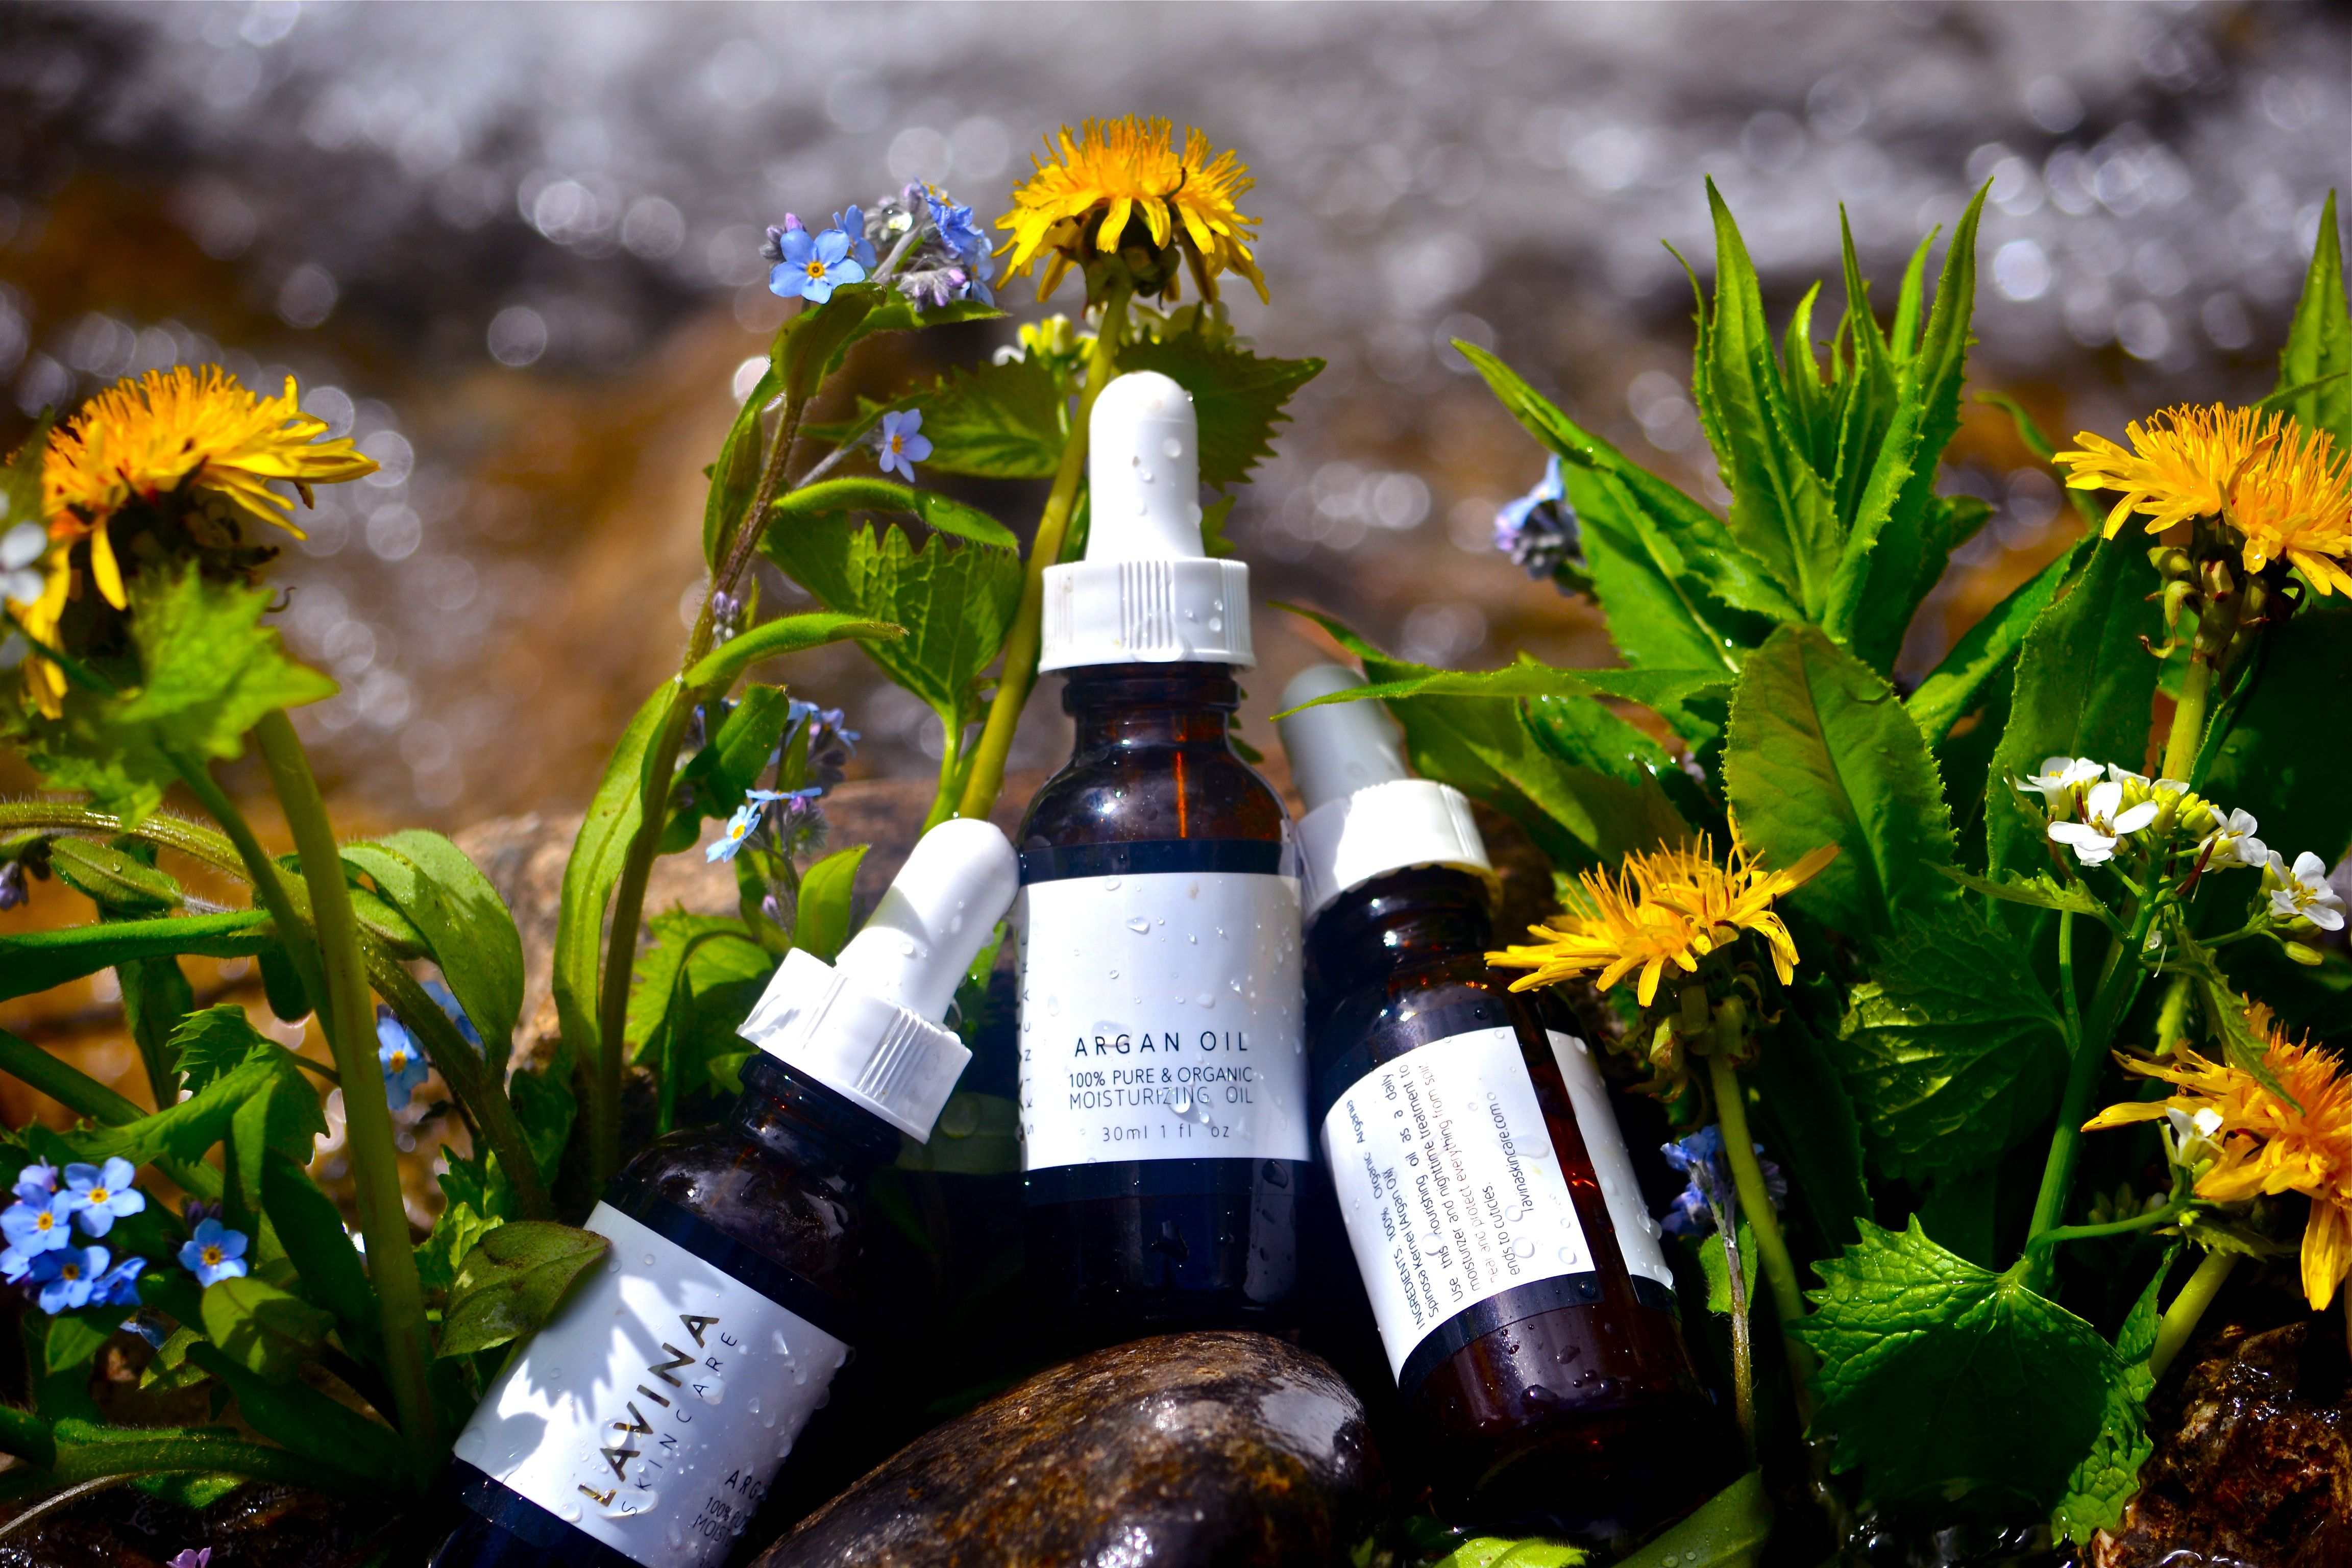 LAVINA Skincare Argan Oil Beauty oil, Argan oil, Oils